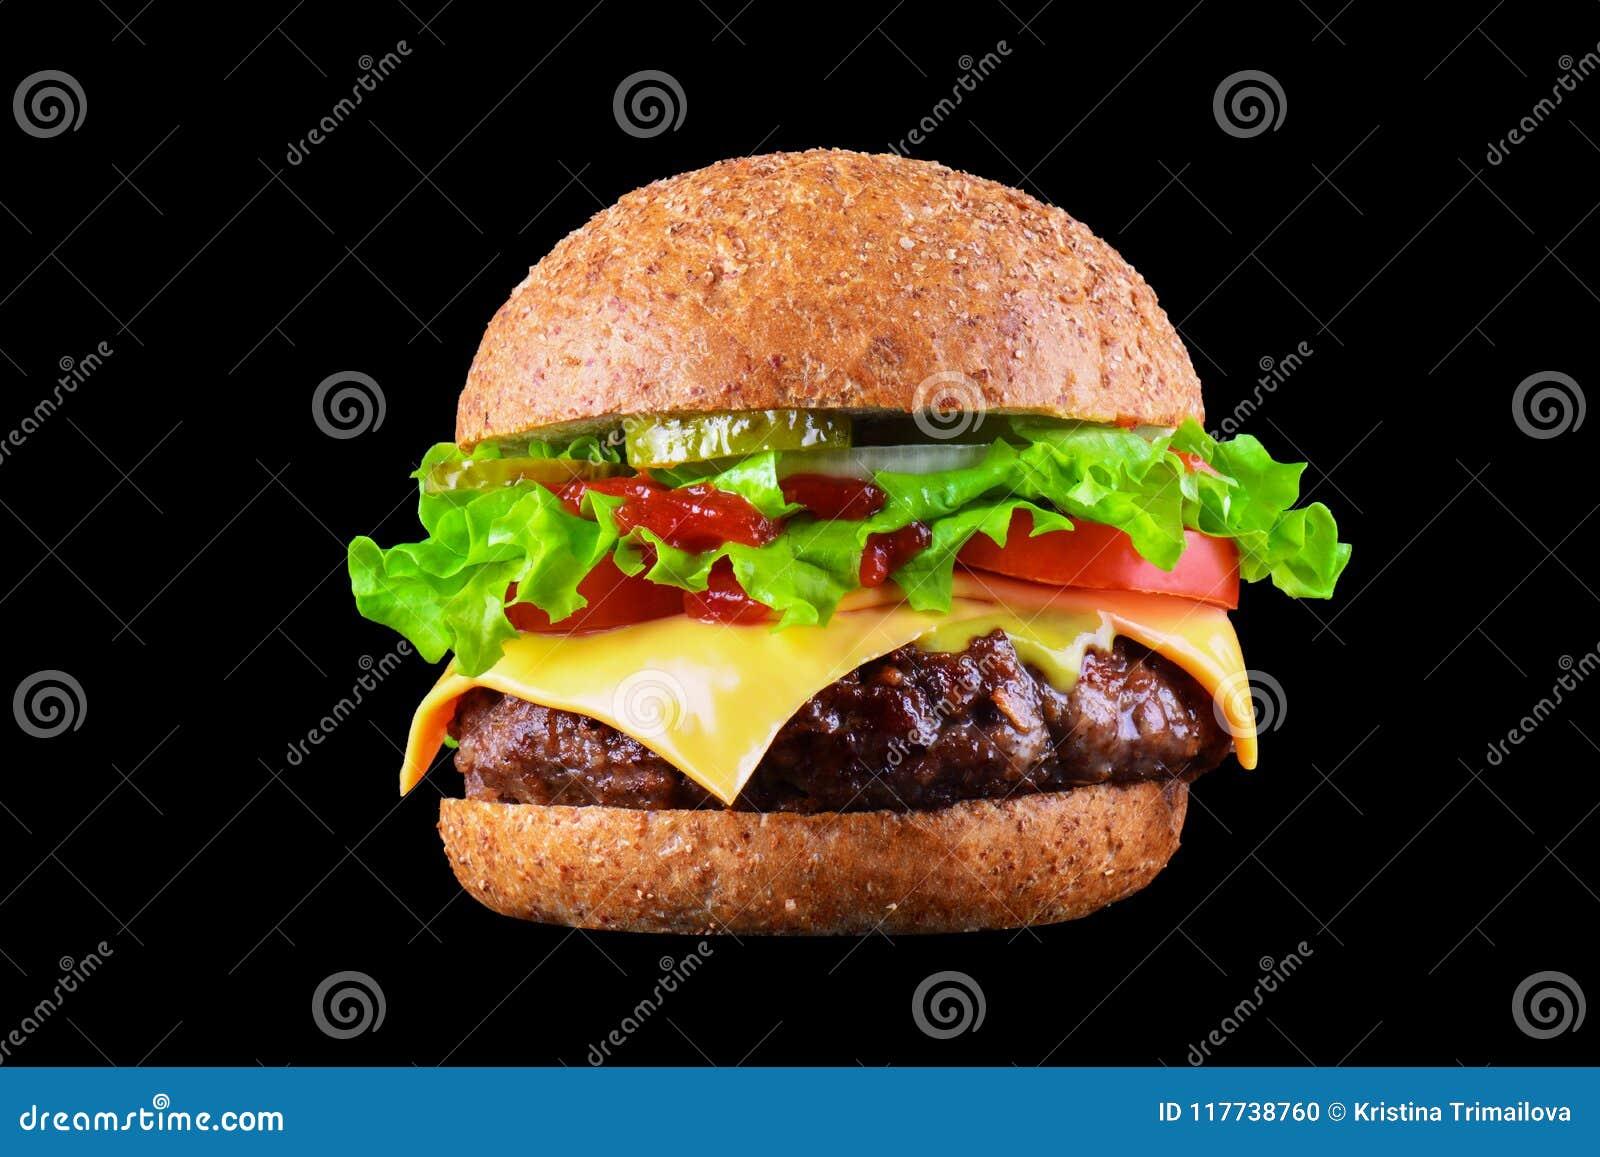 Hamburguesa o cheeseburger sabrosa grande aislado en fondo negro con la carne asada a la parrilla, queso, tomate, tocino, cebolla